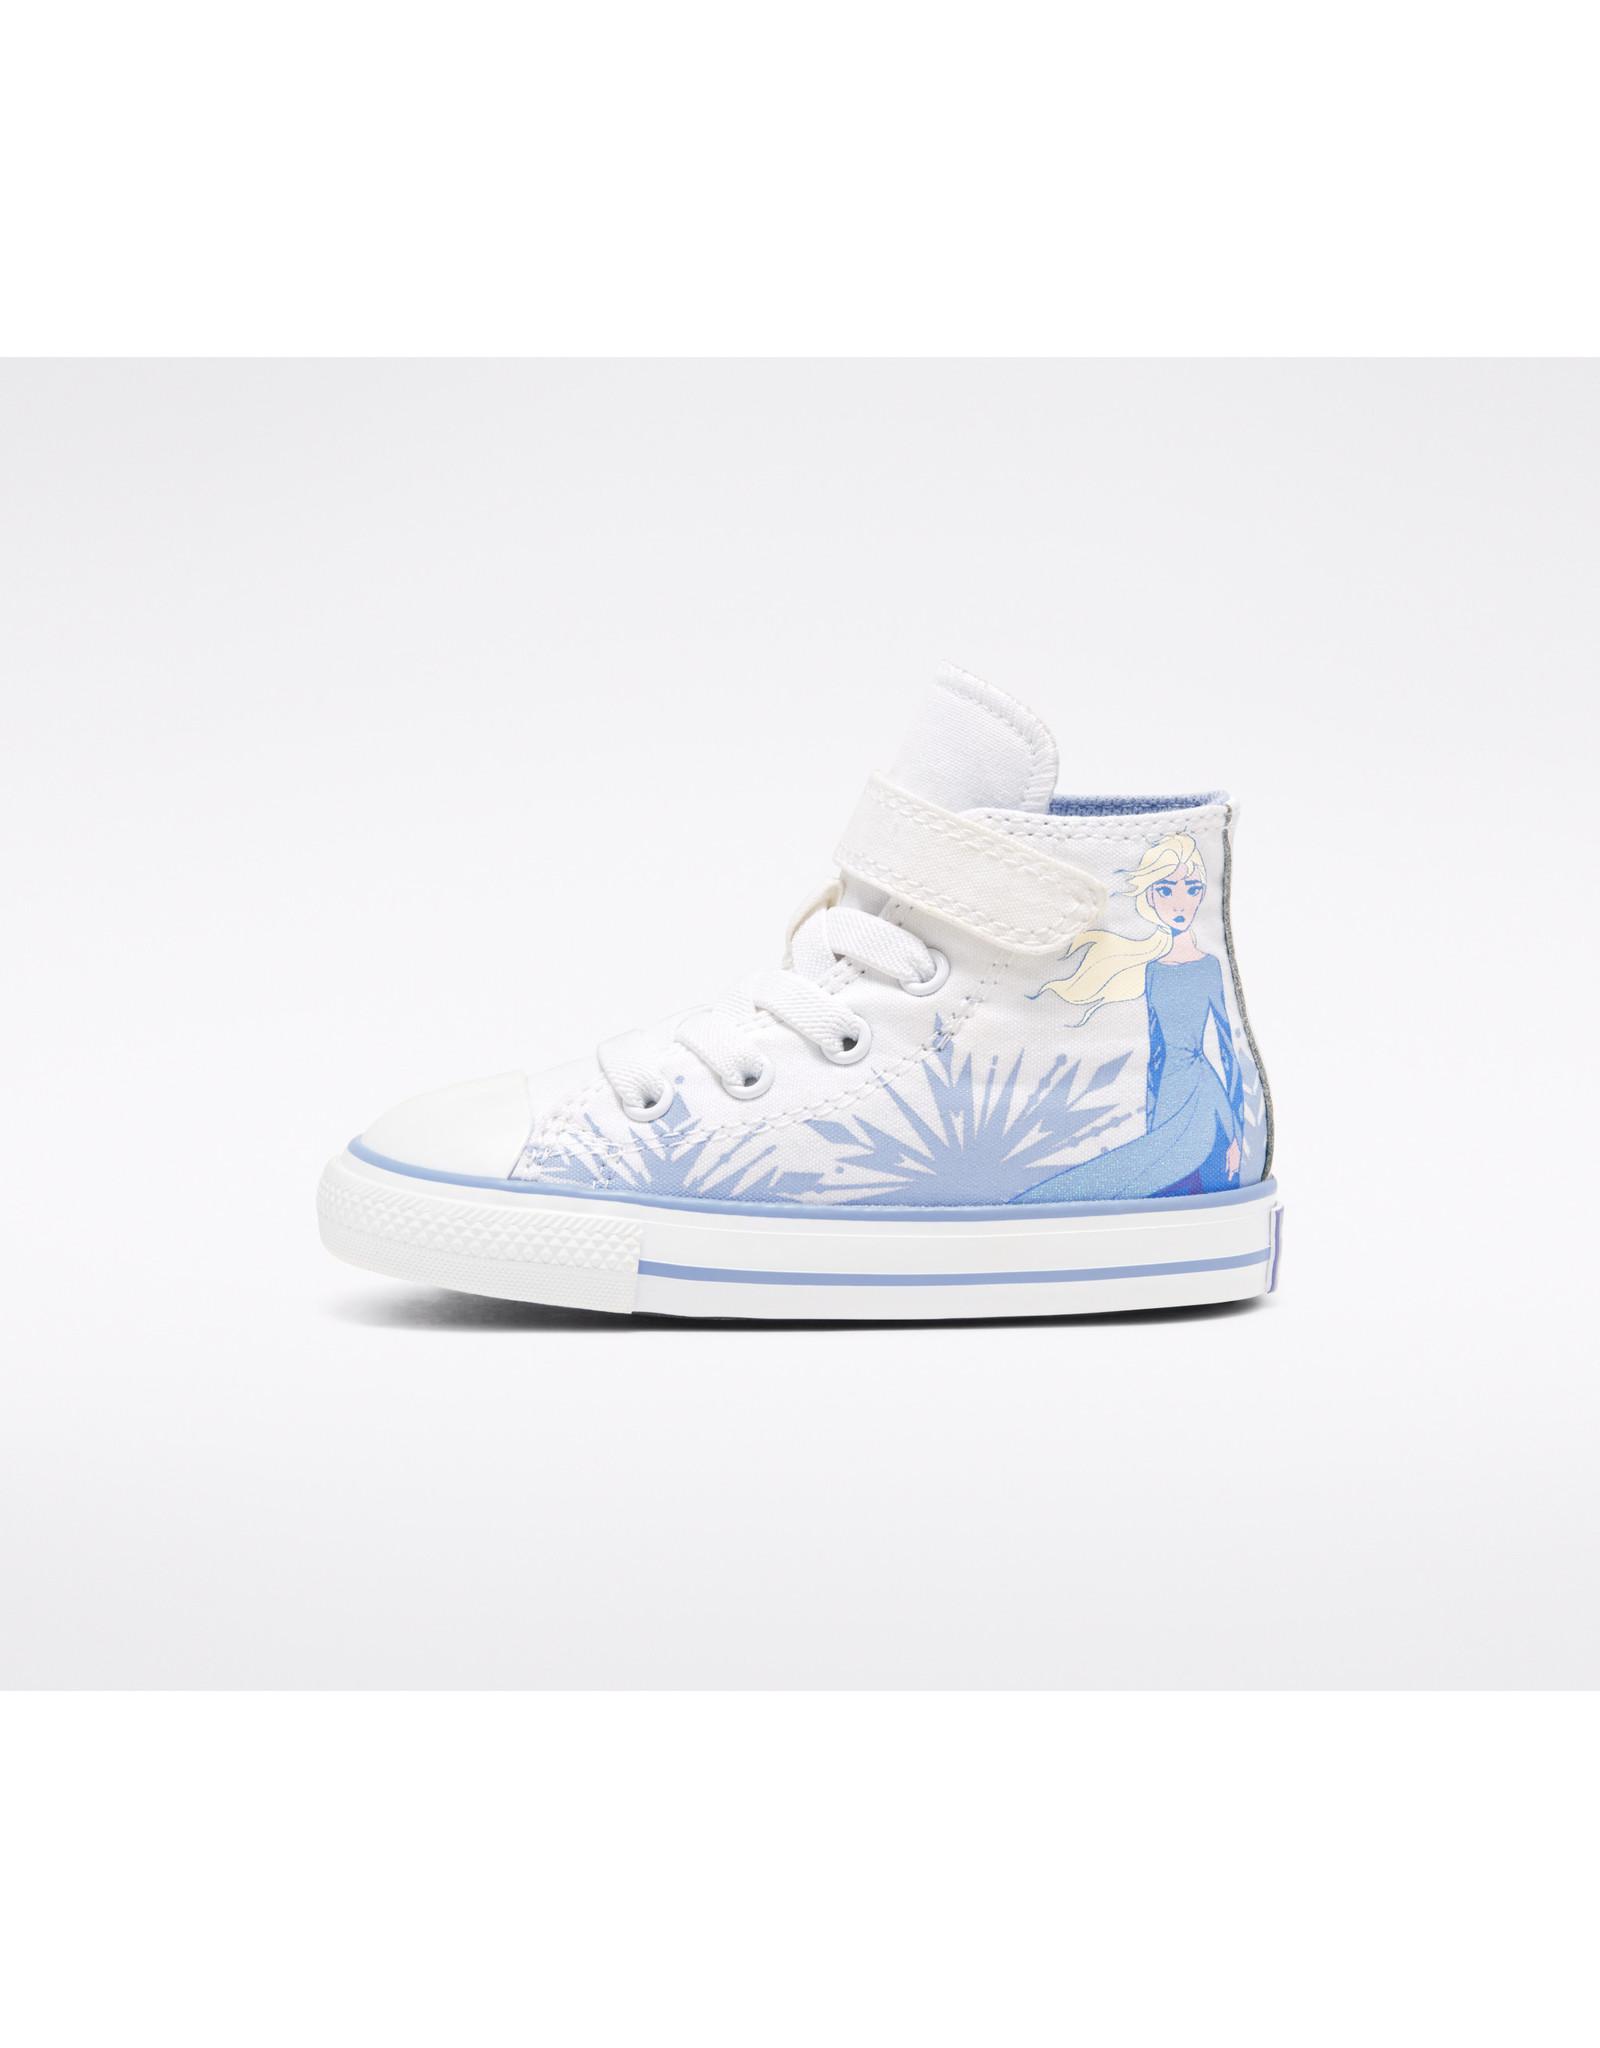 CONVERSE CHUCK TAYLOR ALL STAR 1V HI FROZEN 2 WHITE/BLUE HERON/WHITE CKFZH-767350C